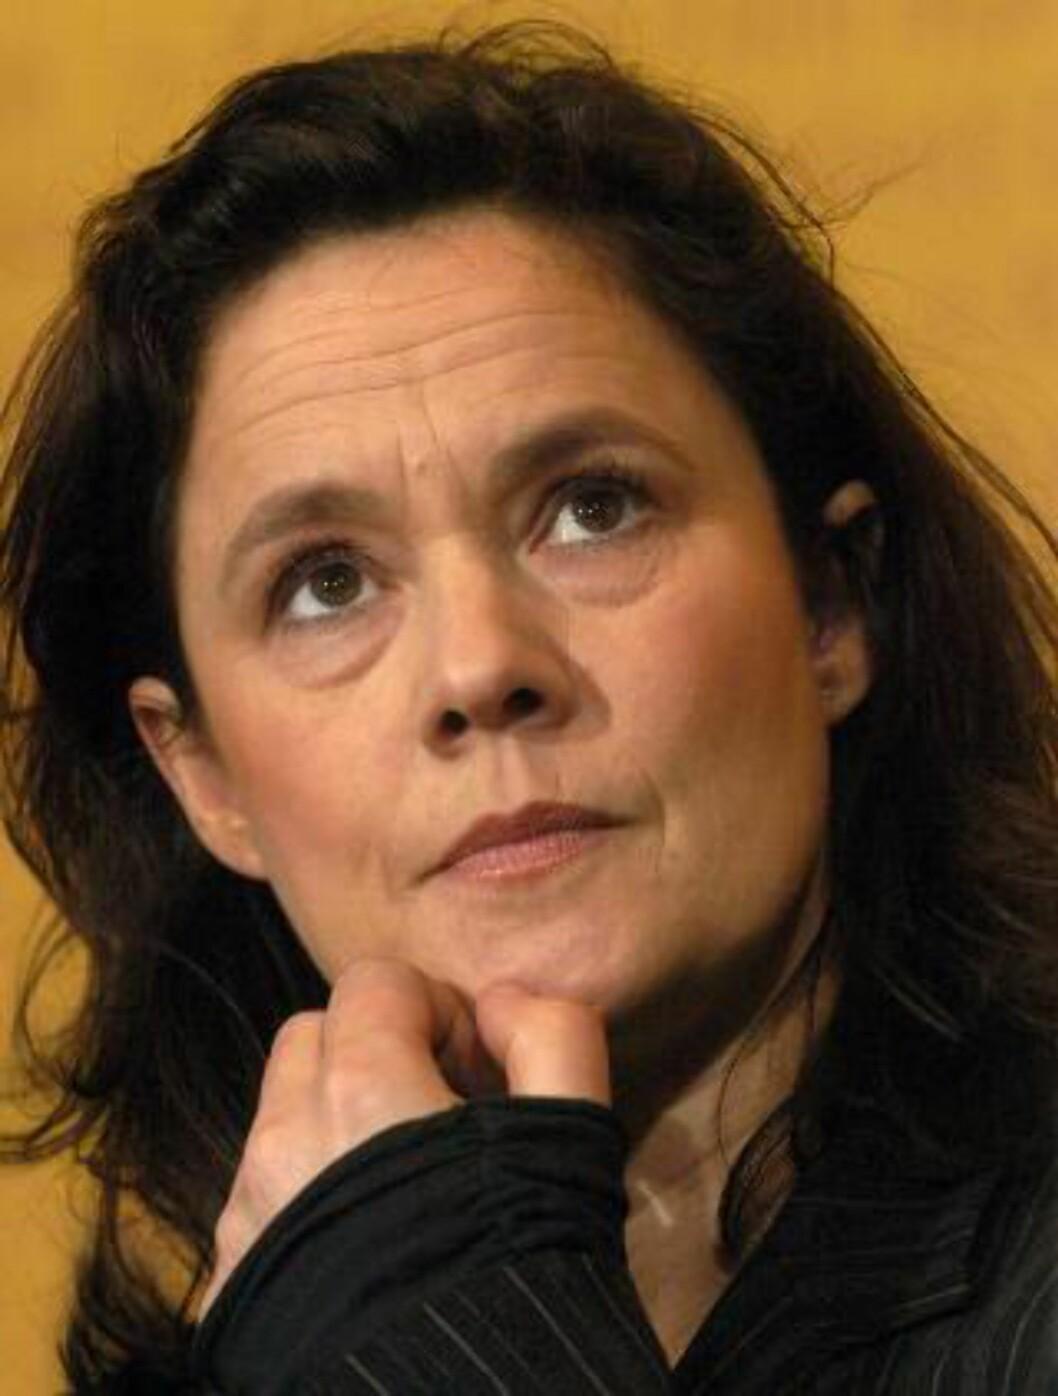 <strong>NOMINERT:</strong> Pernilla August regidebuterte i fjor med «Skyggesiden». Nå er den nominert til Nordisk Råds filmpris. EPA/Andreas Altwein